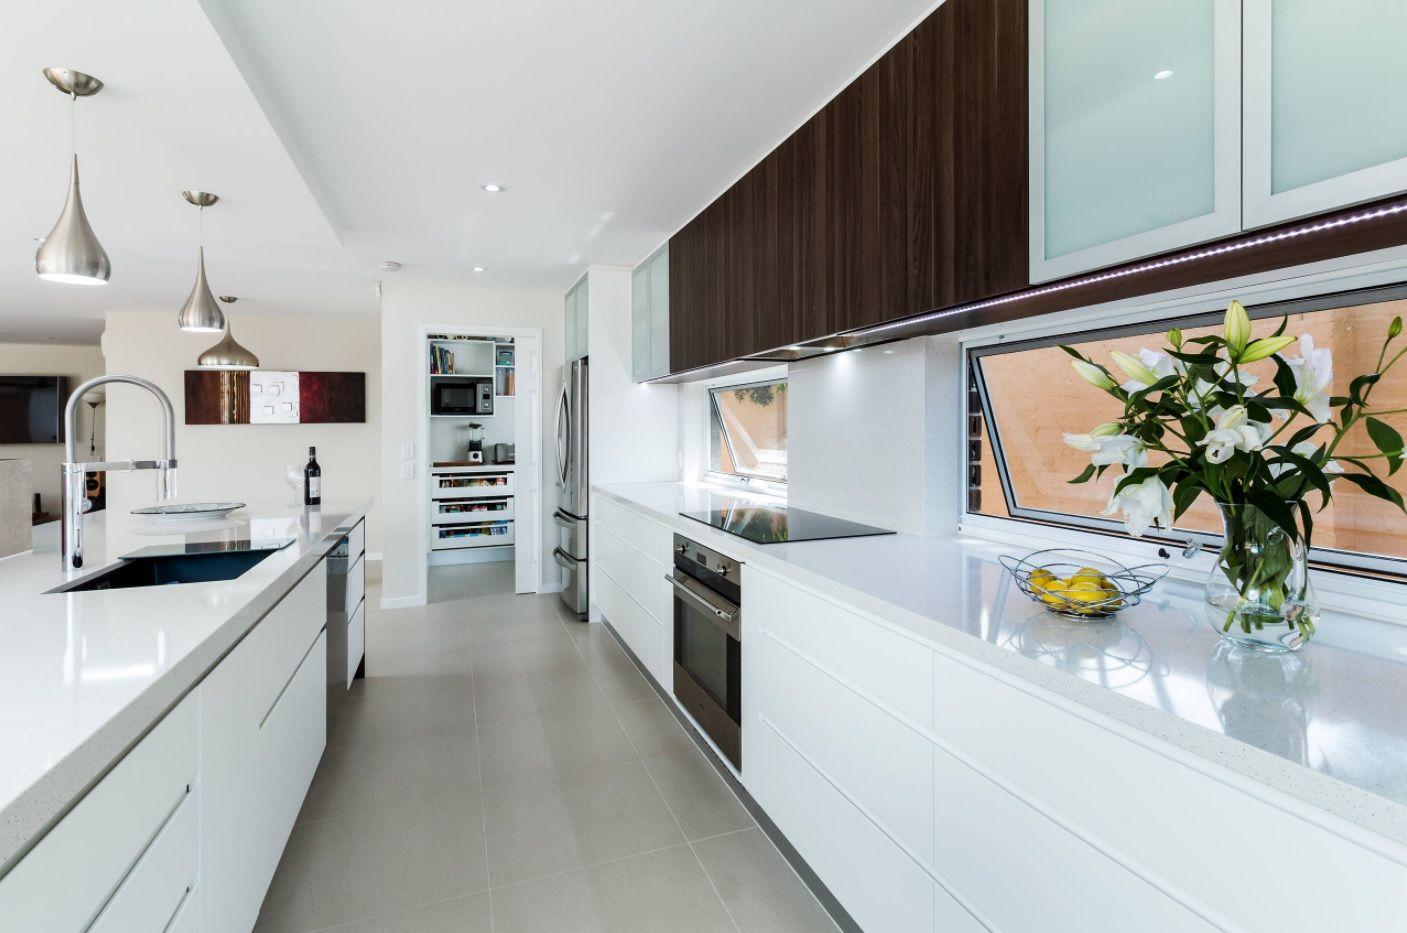 open kitchen design interior decoration small design ideas. Black Bedroom Furniture Sets. Home Design Ideas